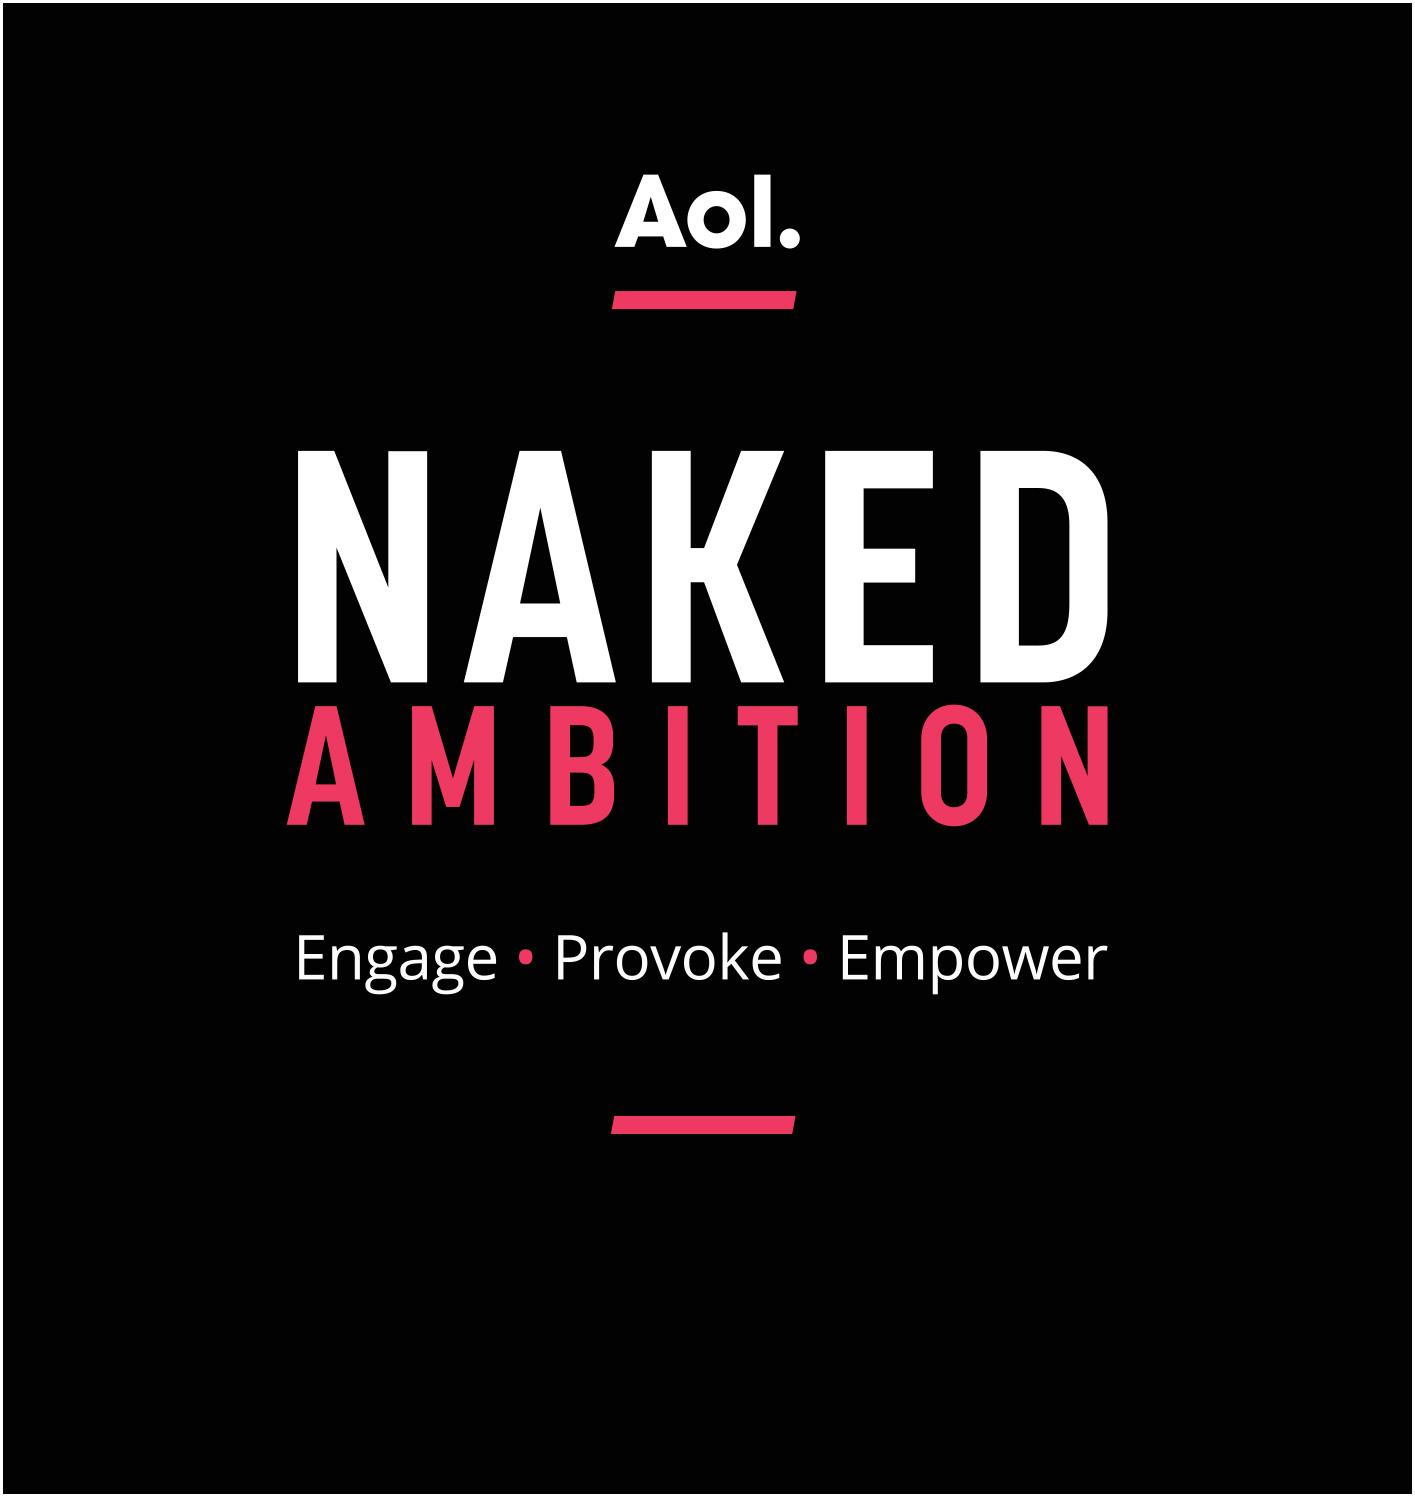 NakedAmbition_elements.jpg